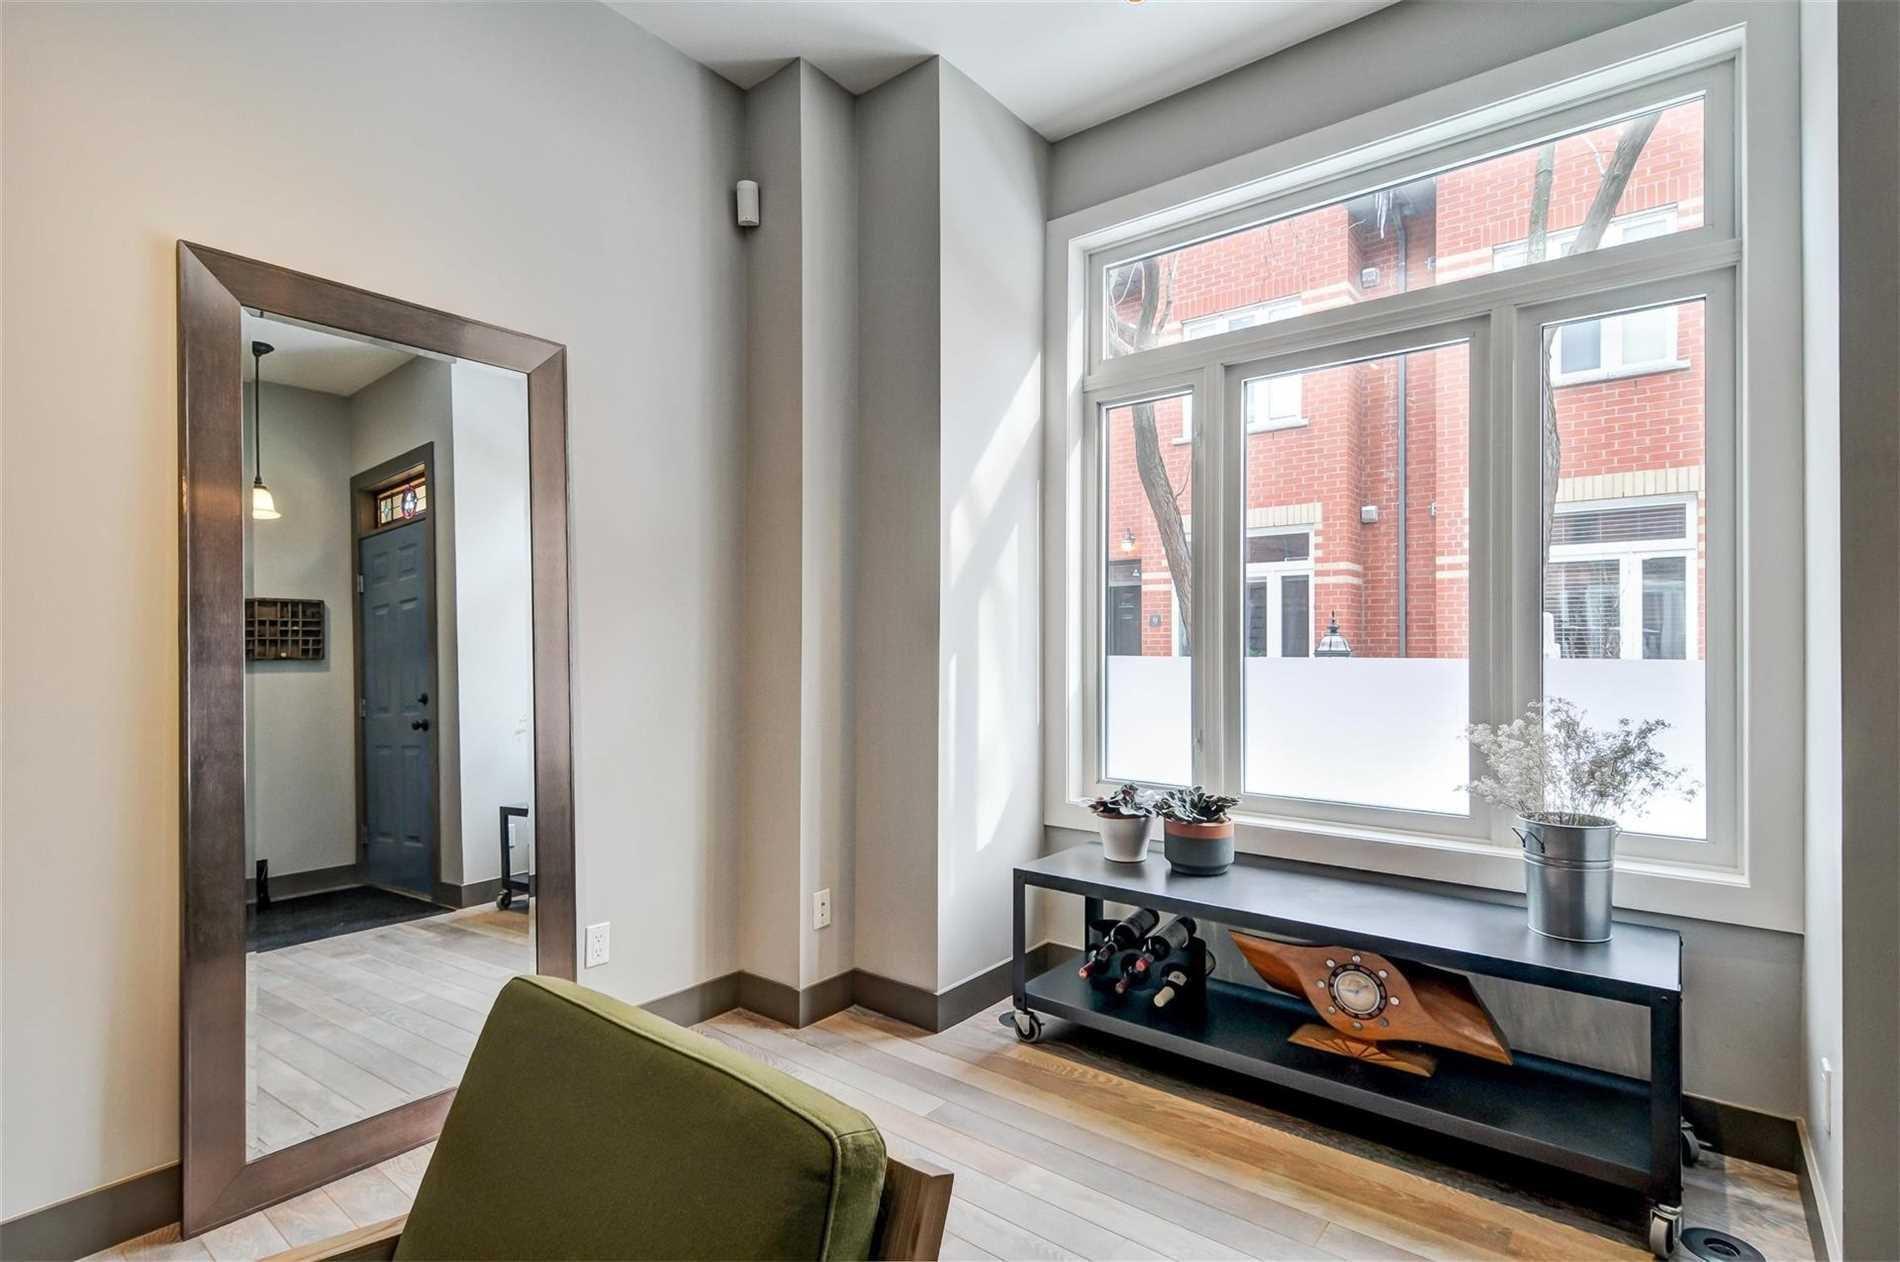 Main Photo: 8 Old Trillium Lane in Toronto: Regent Park House (3-Storey) for sale (Toronto C08)  : MLS®# C4381529